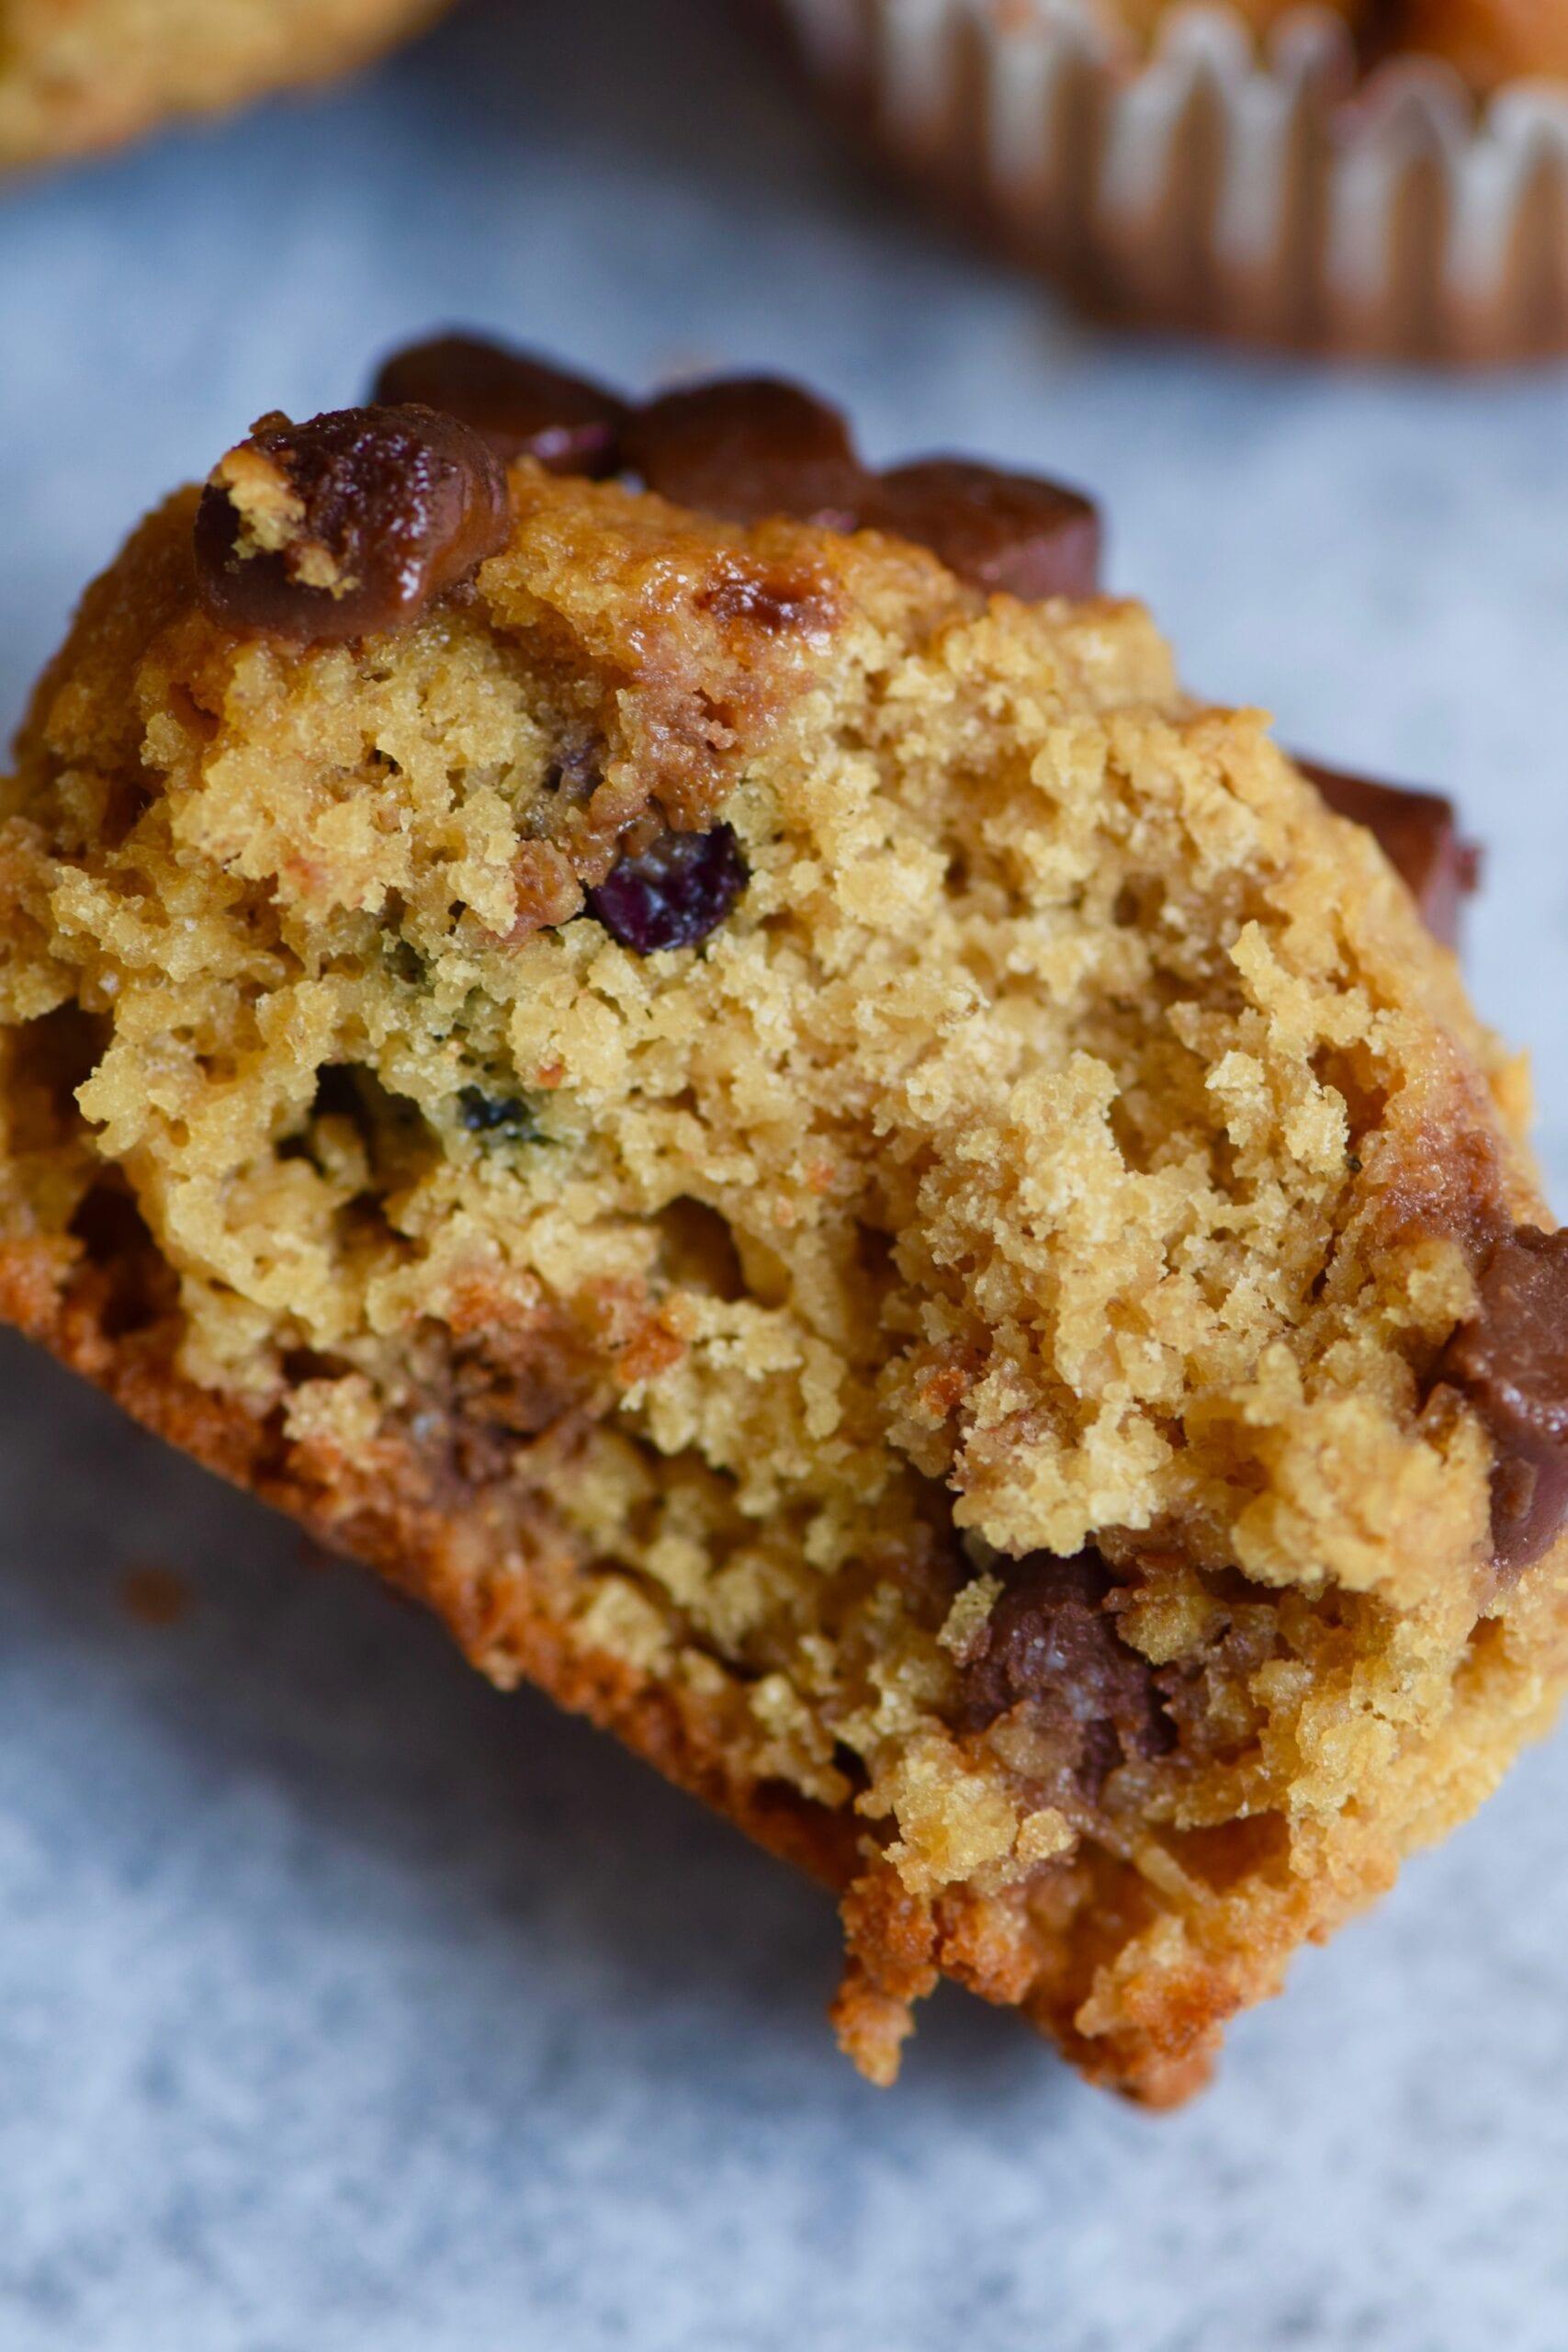 Choc-chip Oatmeal breakfast muffins